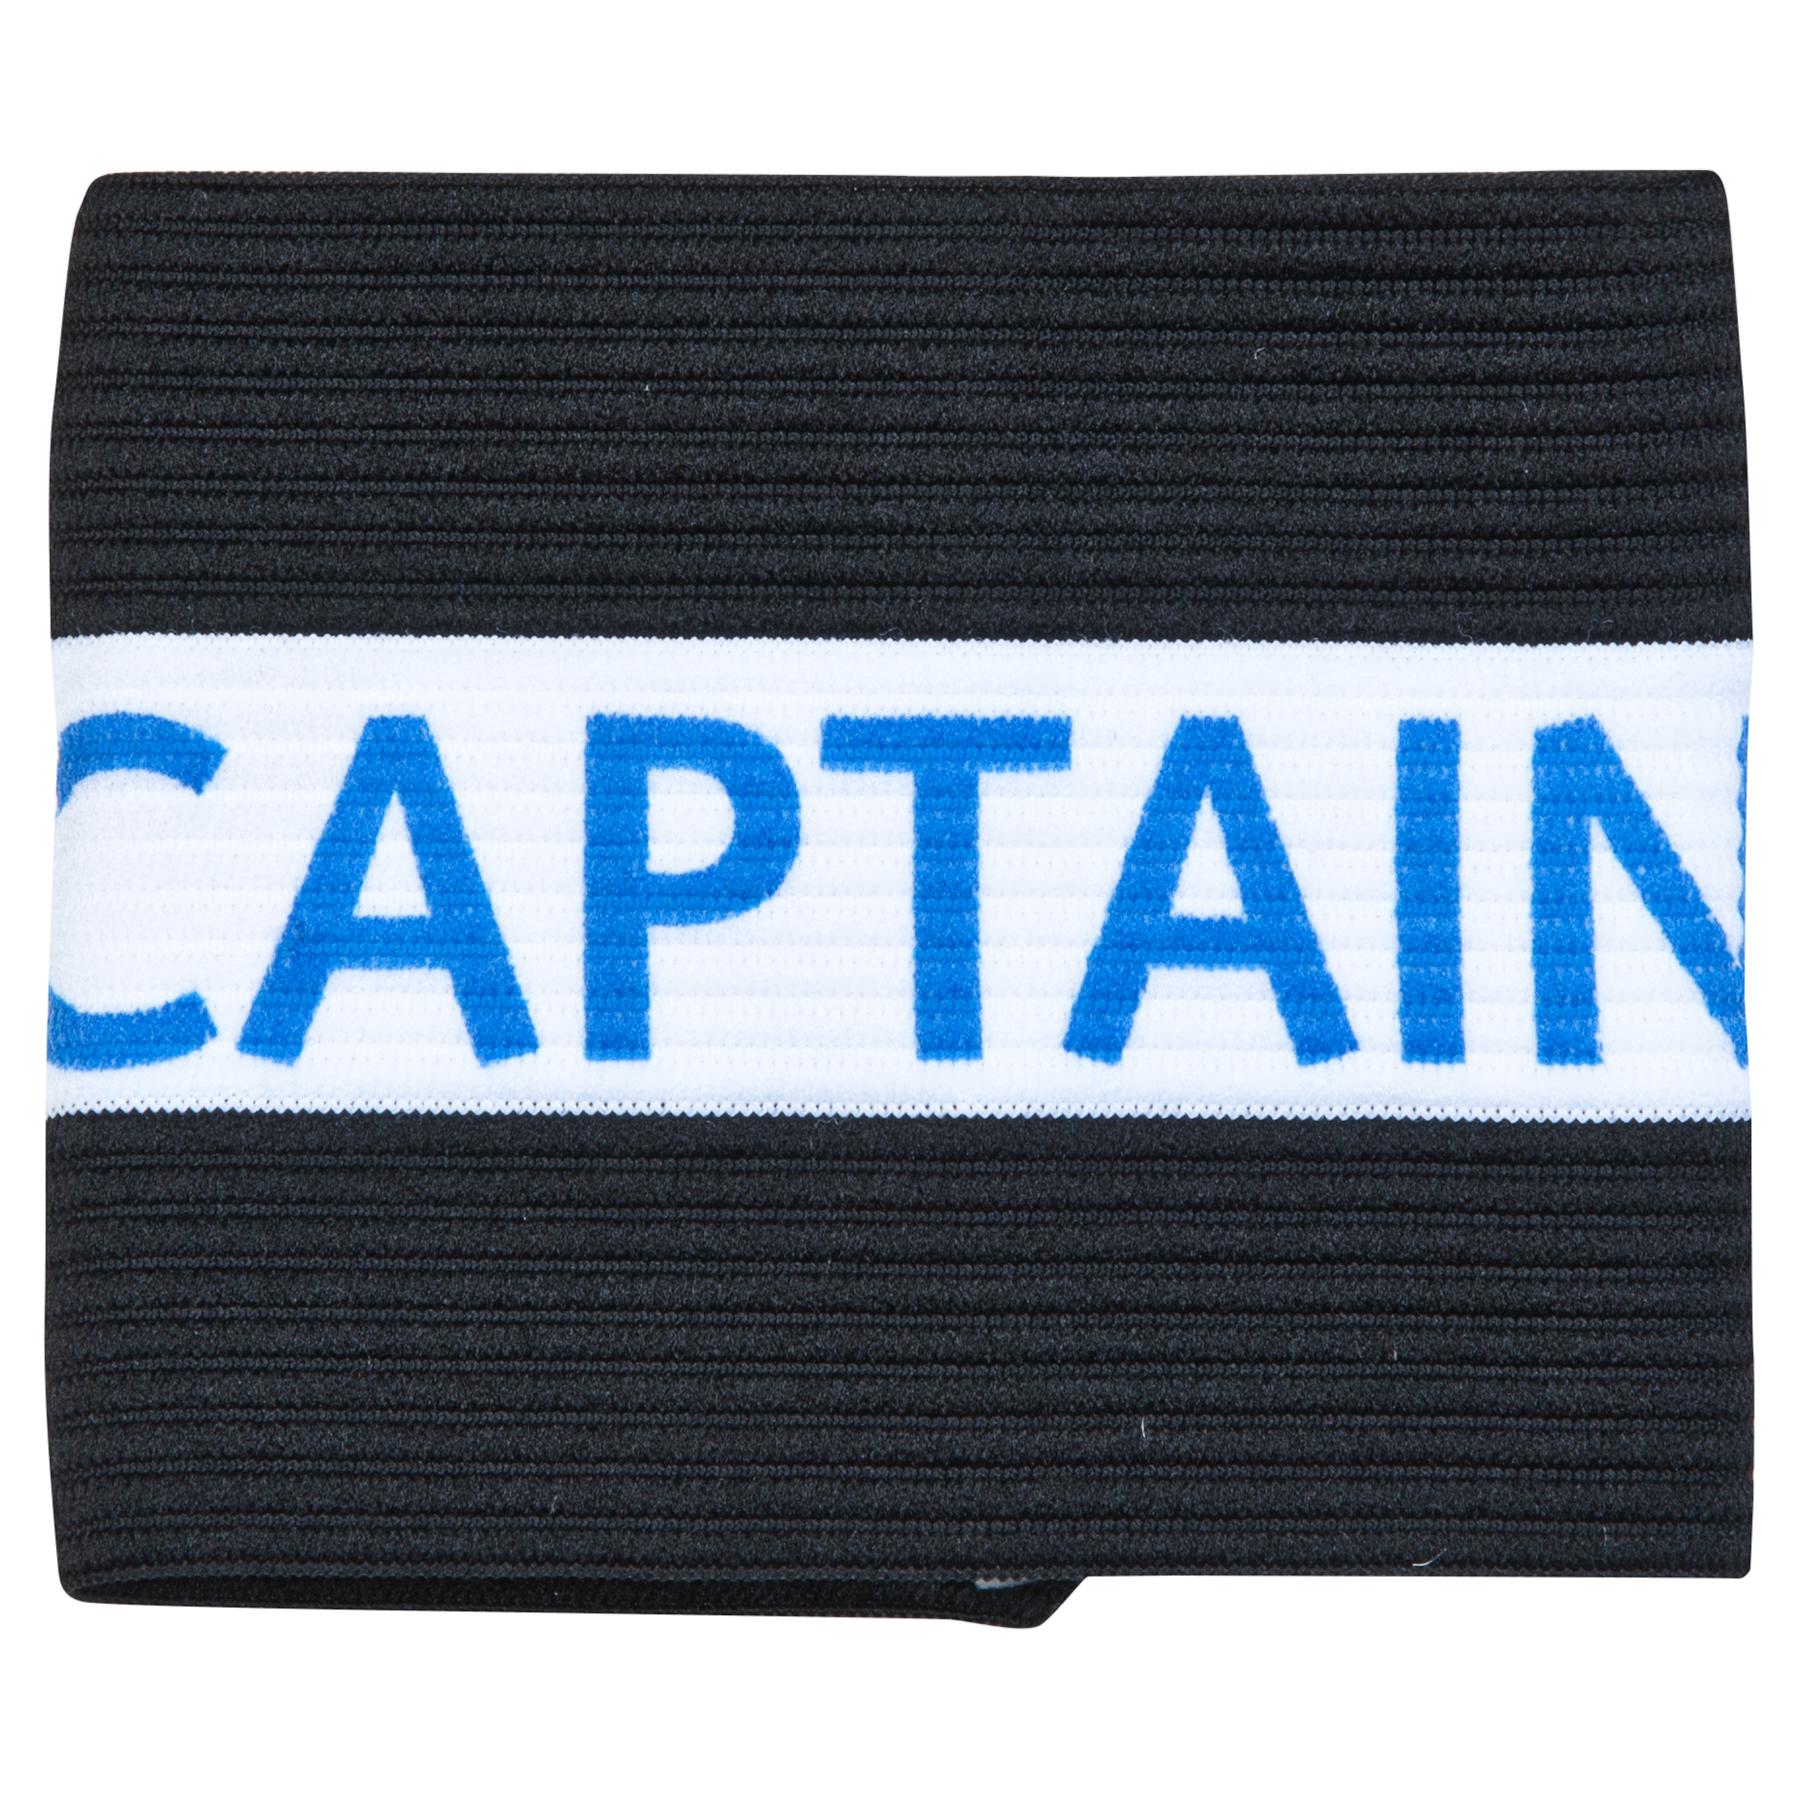 Chelsea Captains Armband